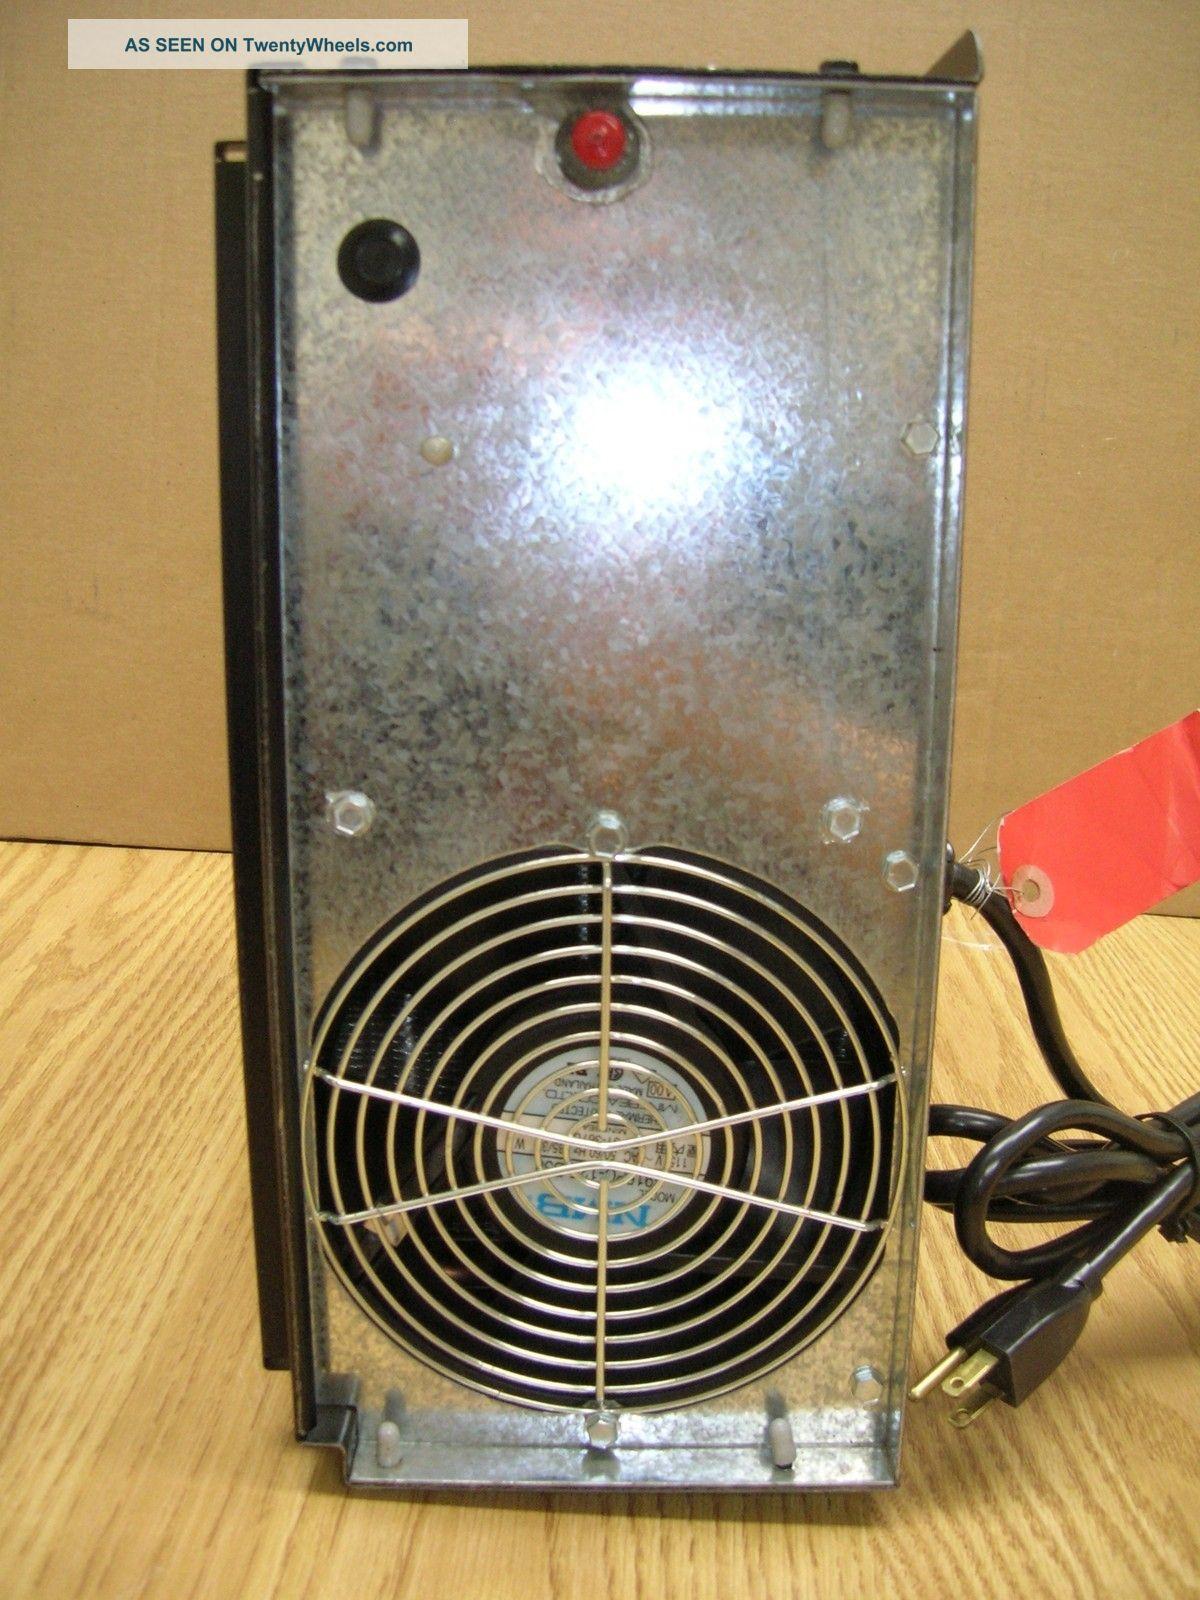 Hoffman Mclean G Enclosure Air Conditioner Btu Lgw on John Deere Air Conditioner